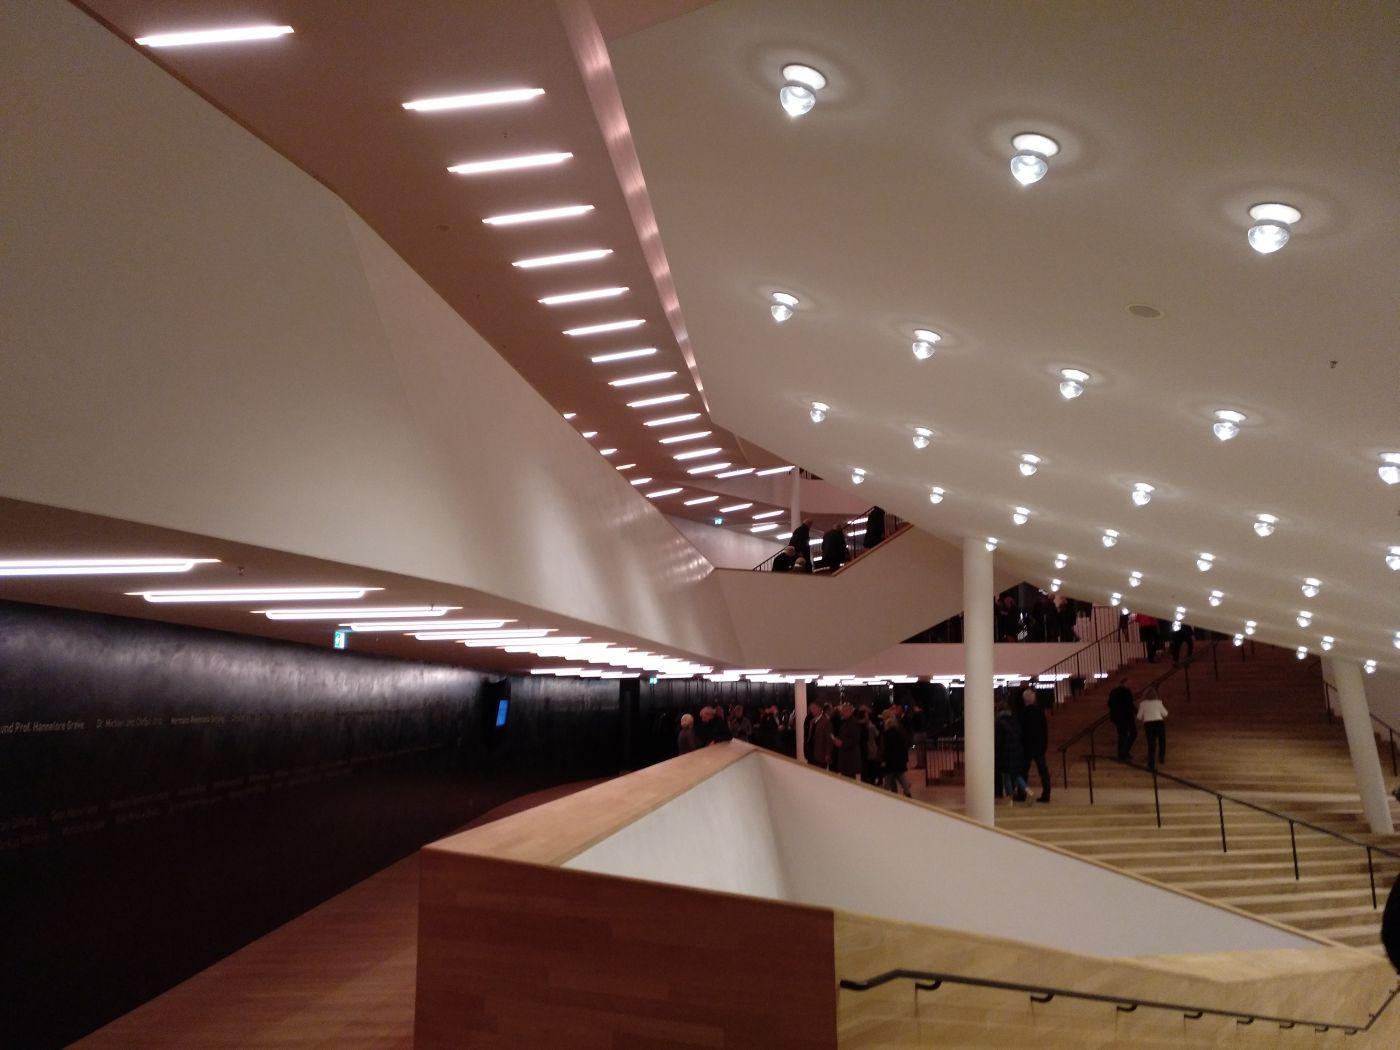 Elbphilharmonie I – City of Birmingham Symphony Orchestra – mehrlicht